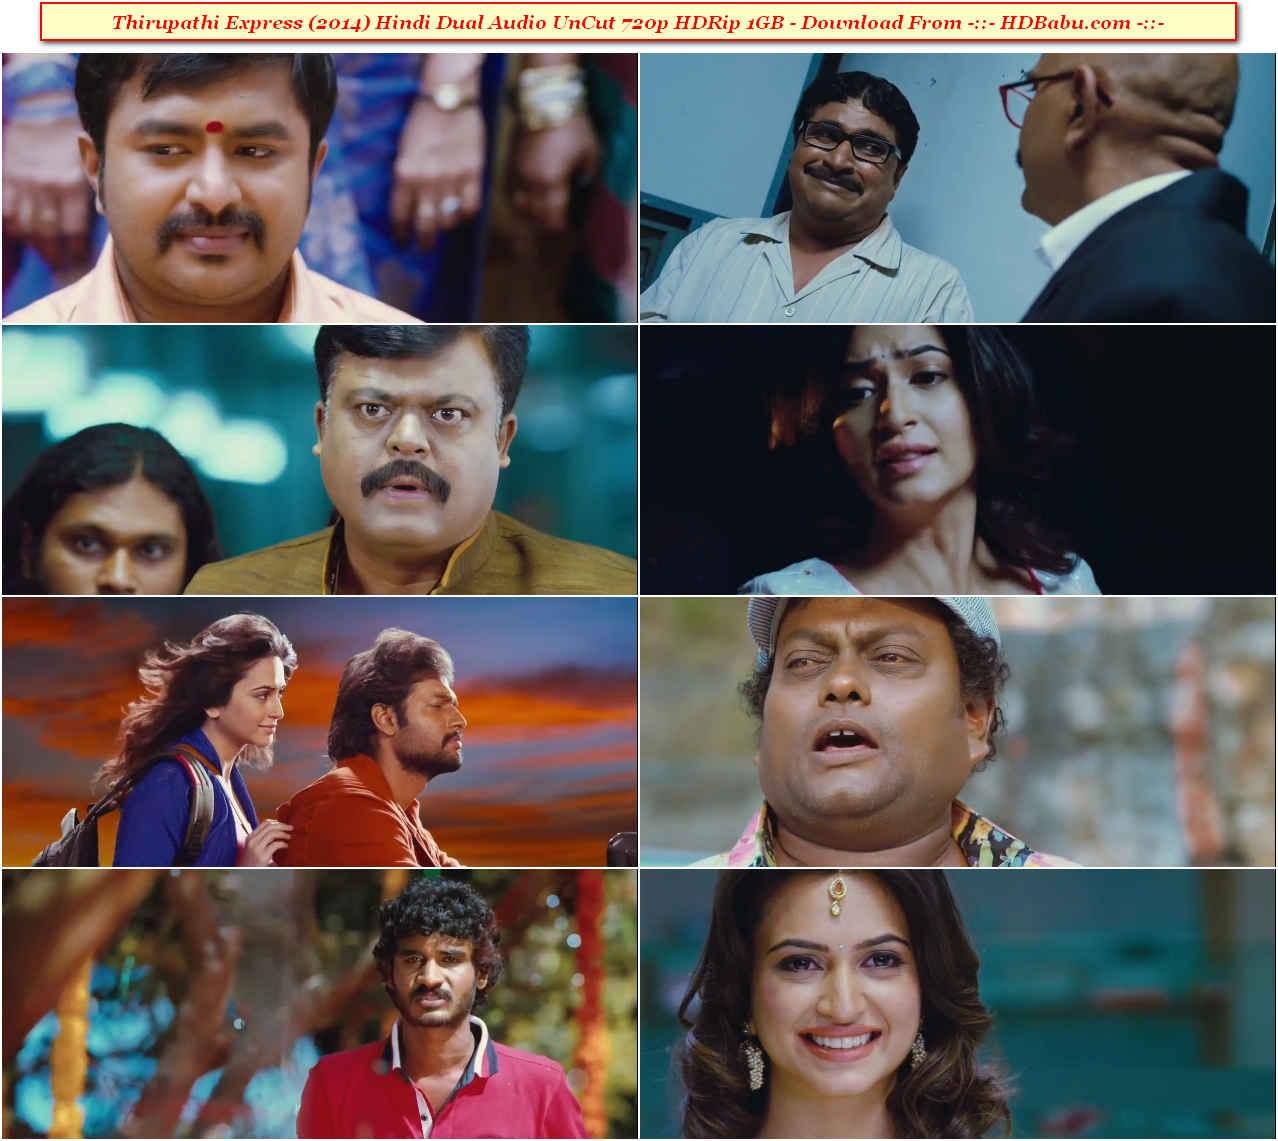 Thirupathi Express Hindi Dubbed Full Movie Download